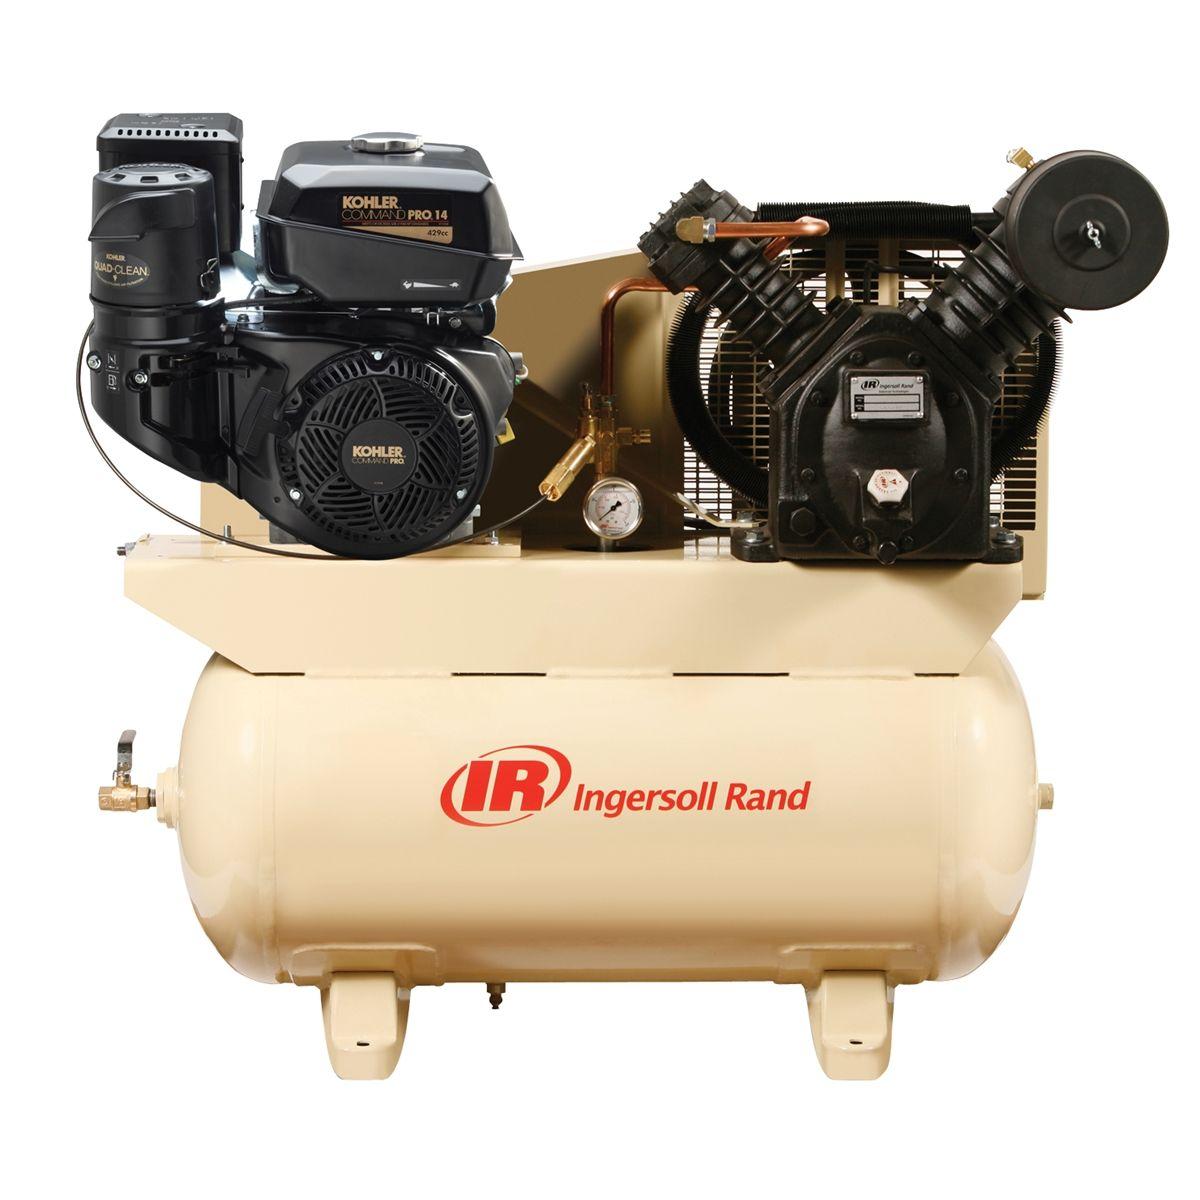 Gas Drive Air Compressor 14hp Kohler Engine Ingersoll